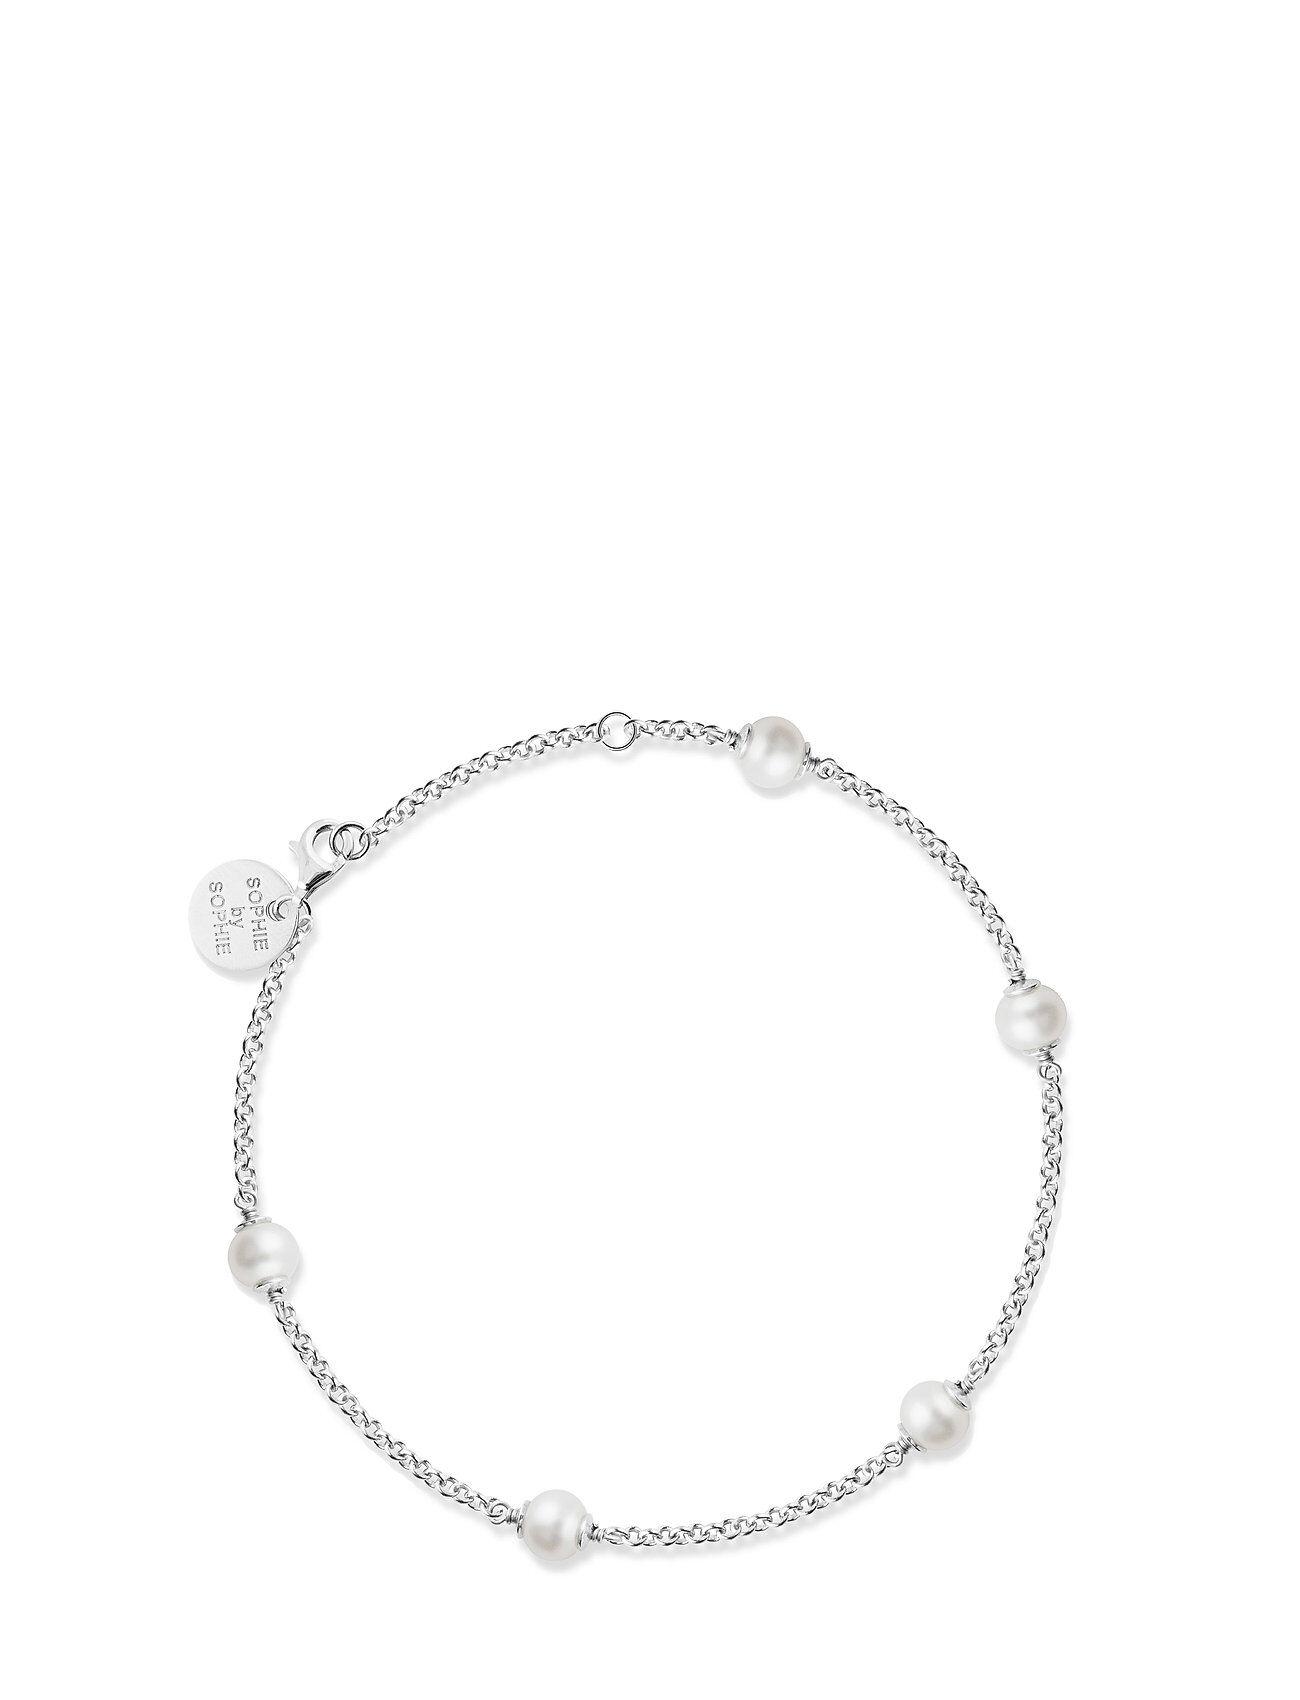 SOPHIE by SOPHIE Funky Pearl Bracelet Accessories Jewellery Bracelets Chain Bracelets Hopea SOPHIE By SOPHIE